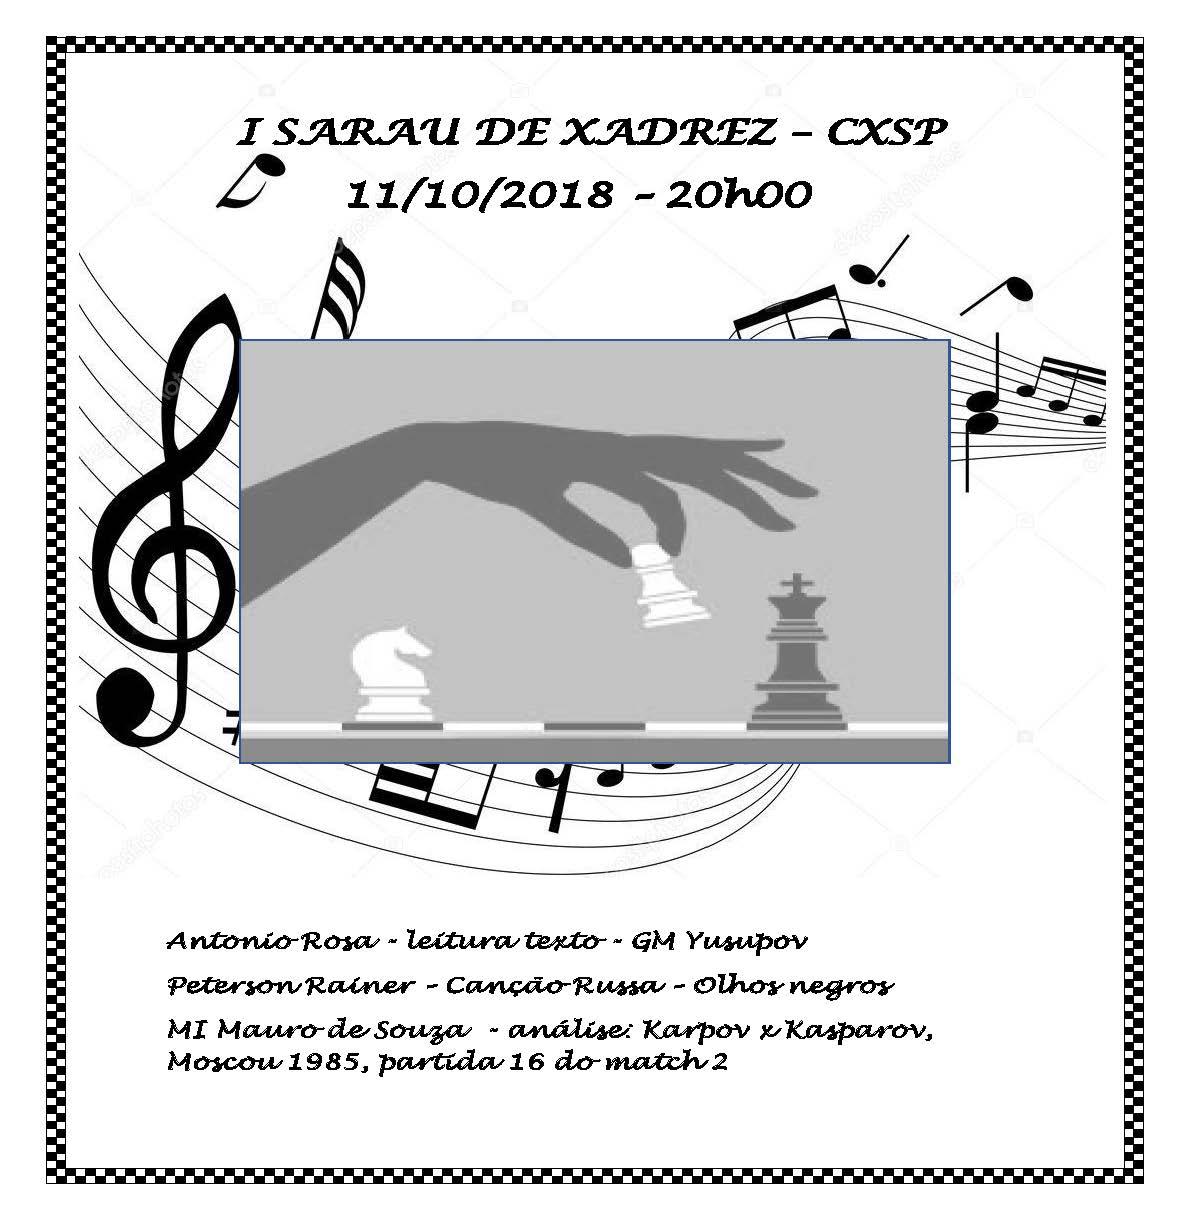 I SARAU DE XADREZ – CXSP